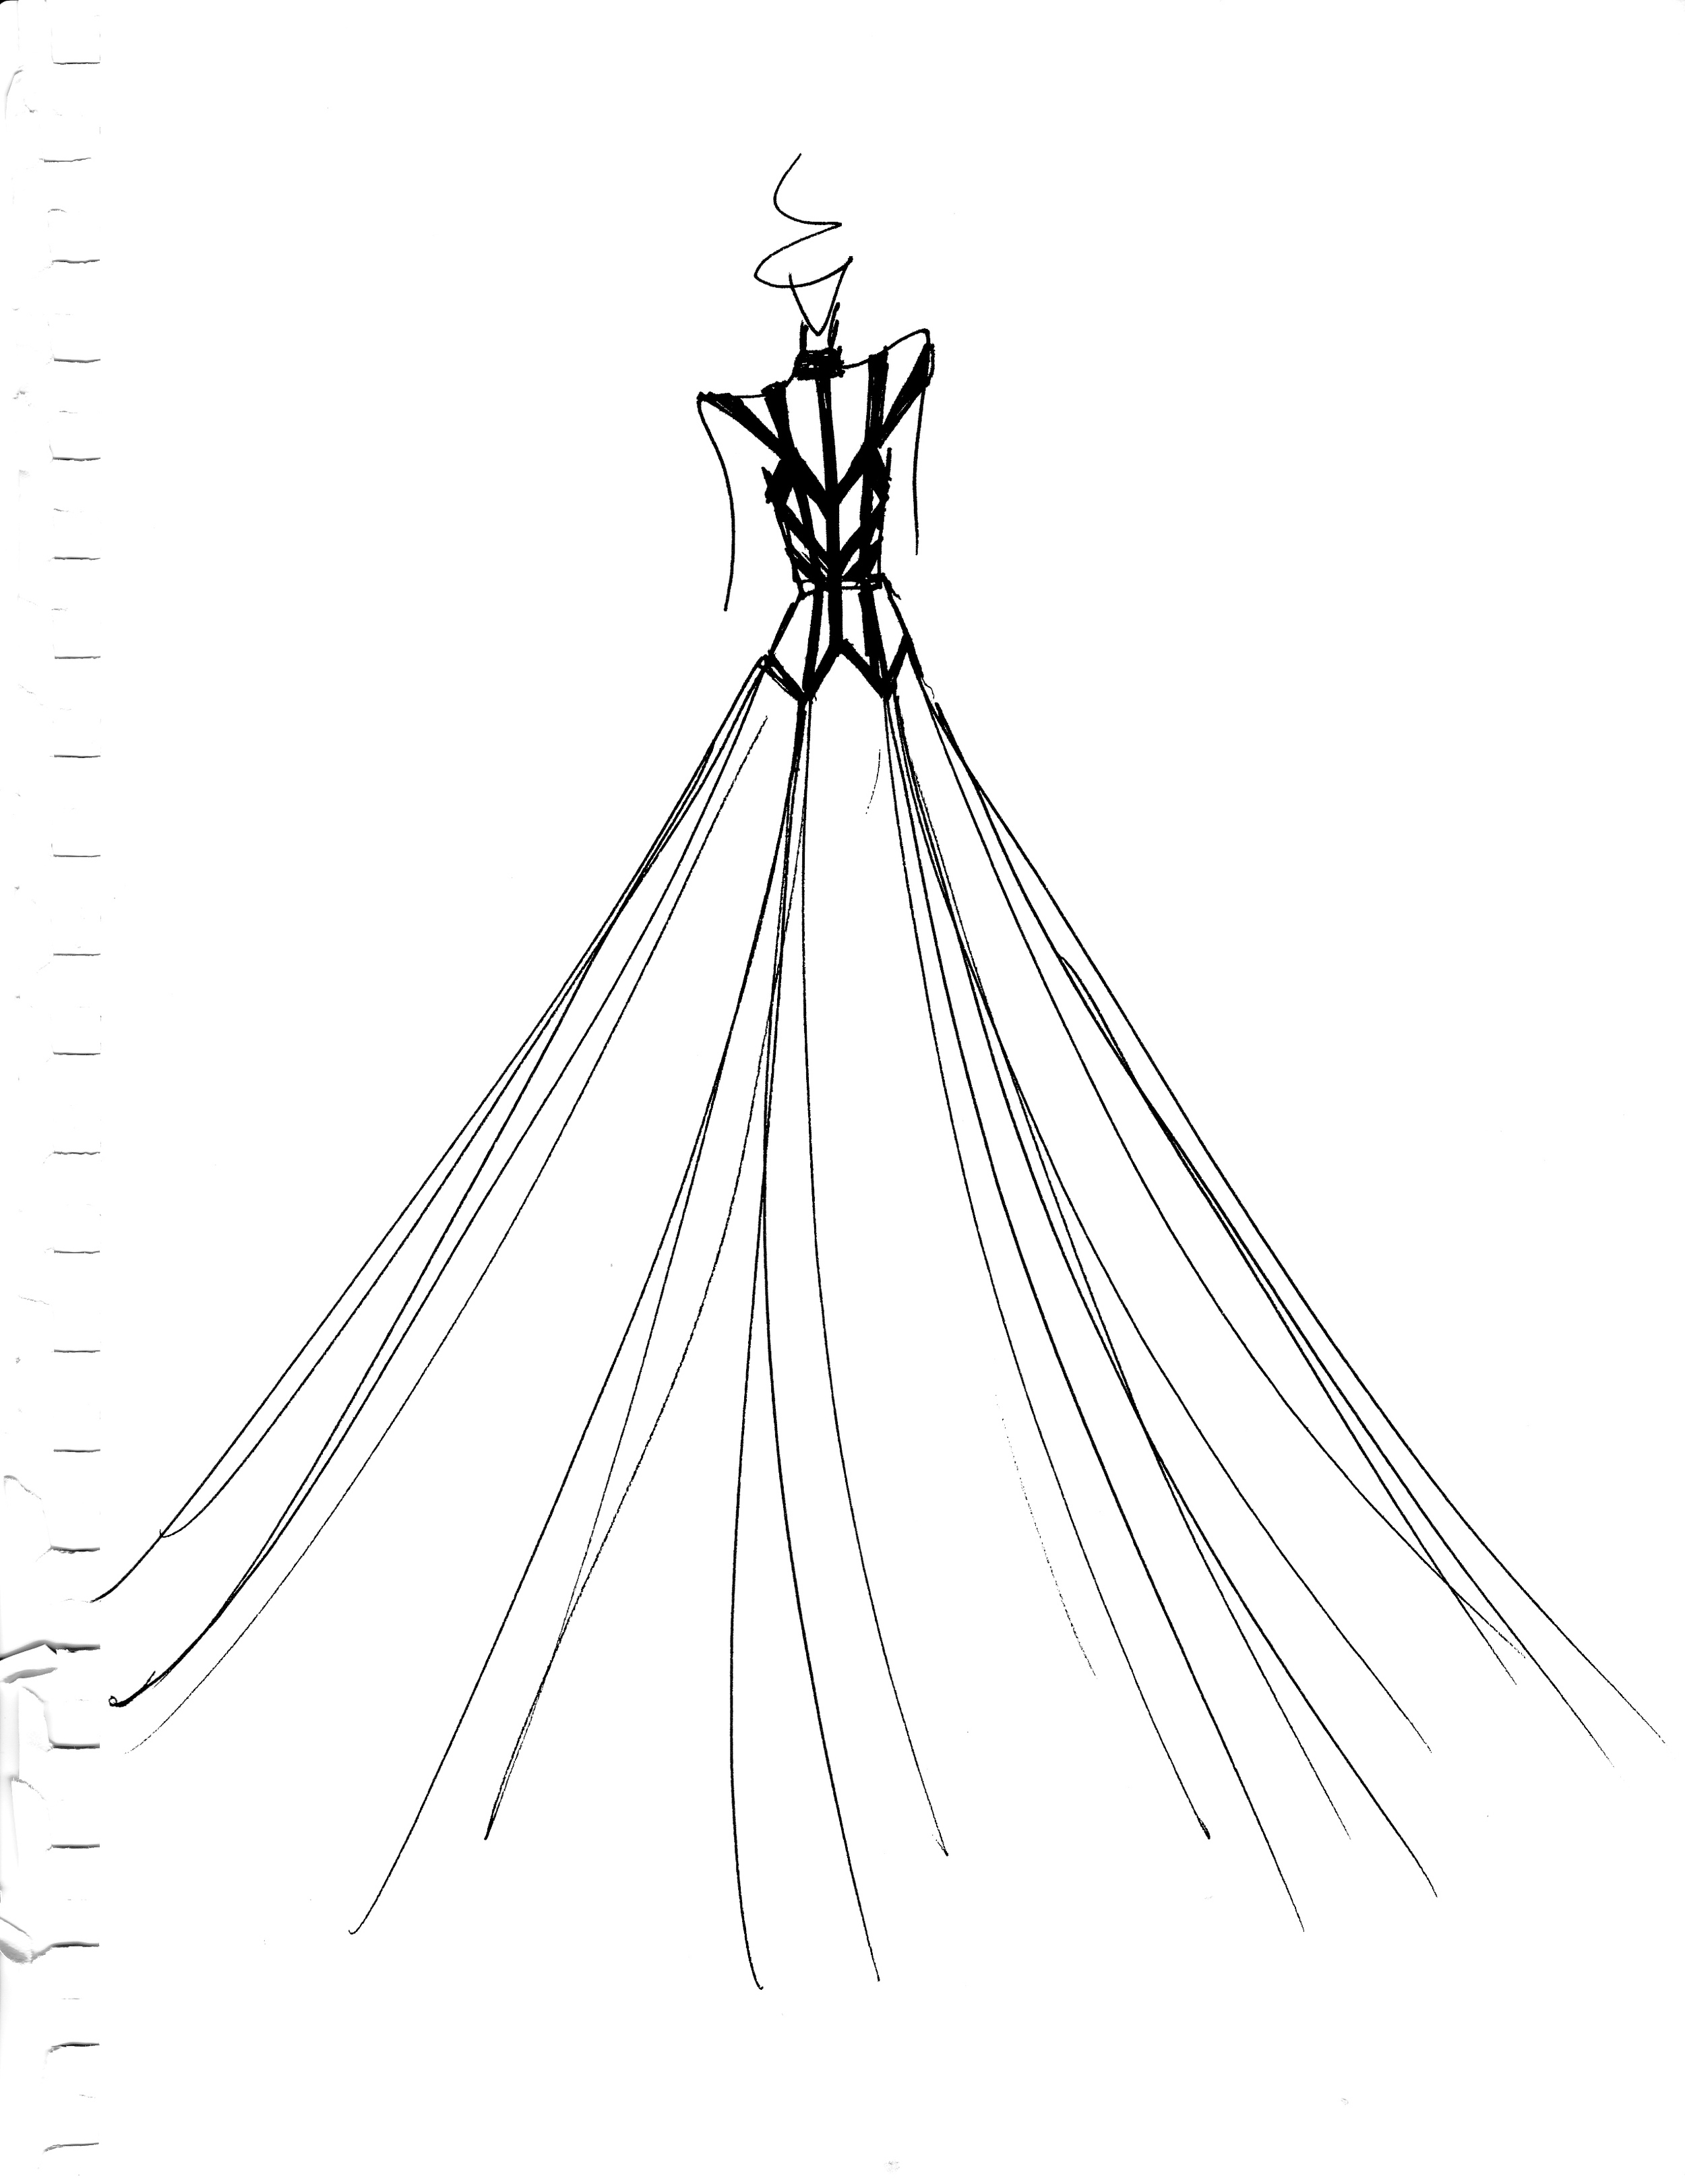 Carol Hannah custom sketch for Kelsea Ballerini